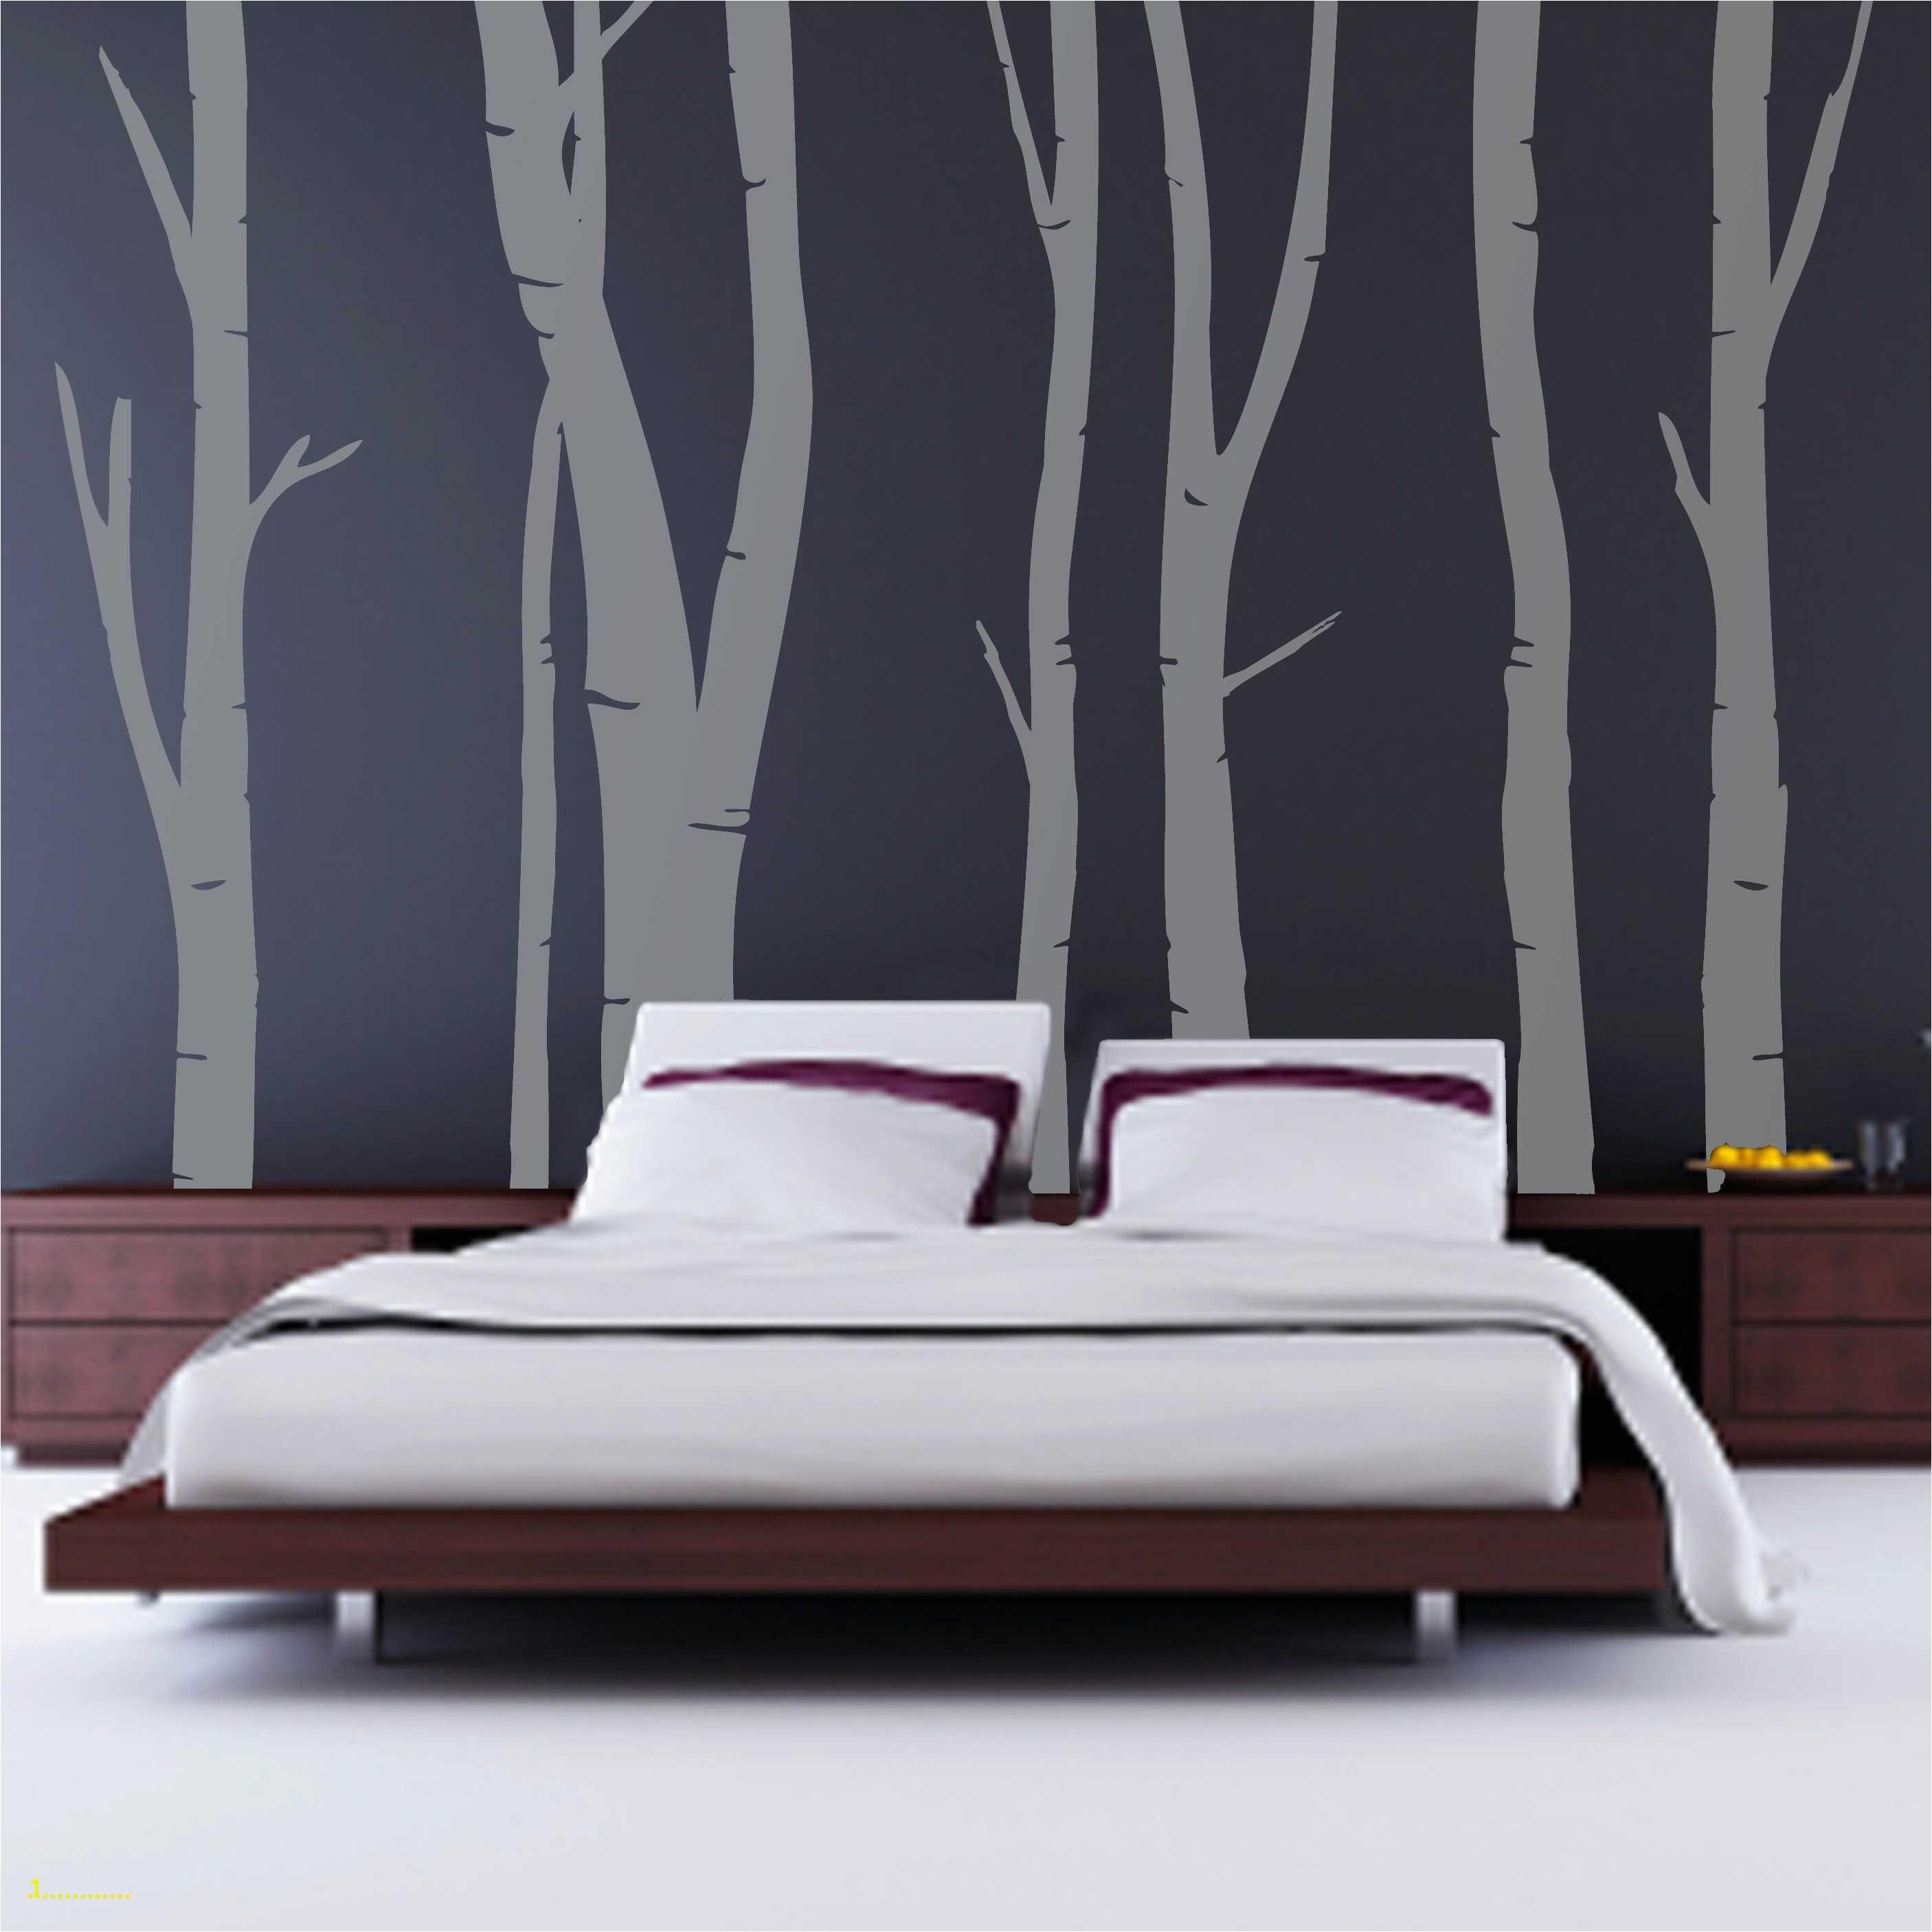 steampunk wall decor Ideas Wall Decals for Bedroom Unique 1 Kirkland Wall Decor Home Design 0d